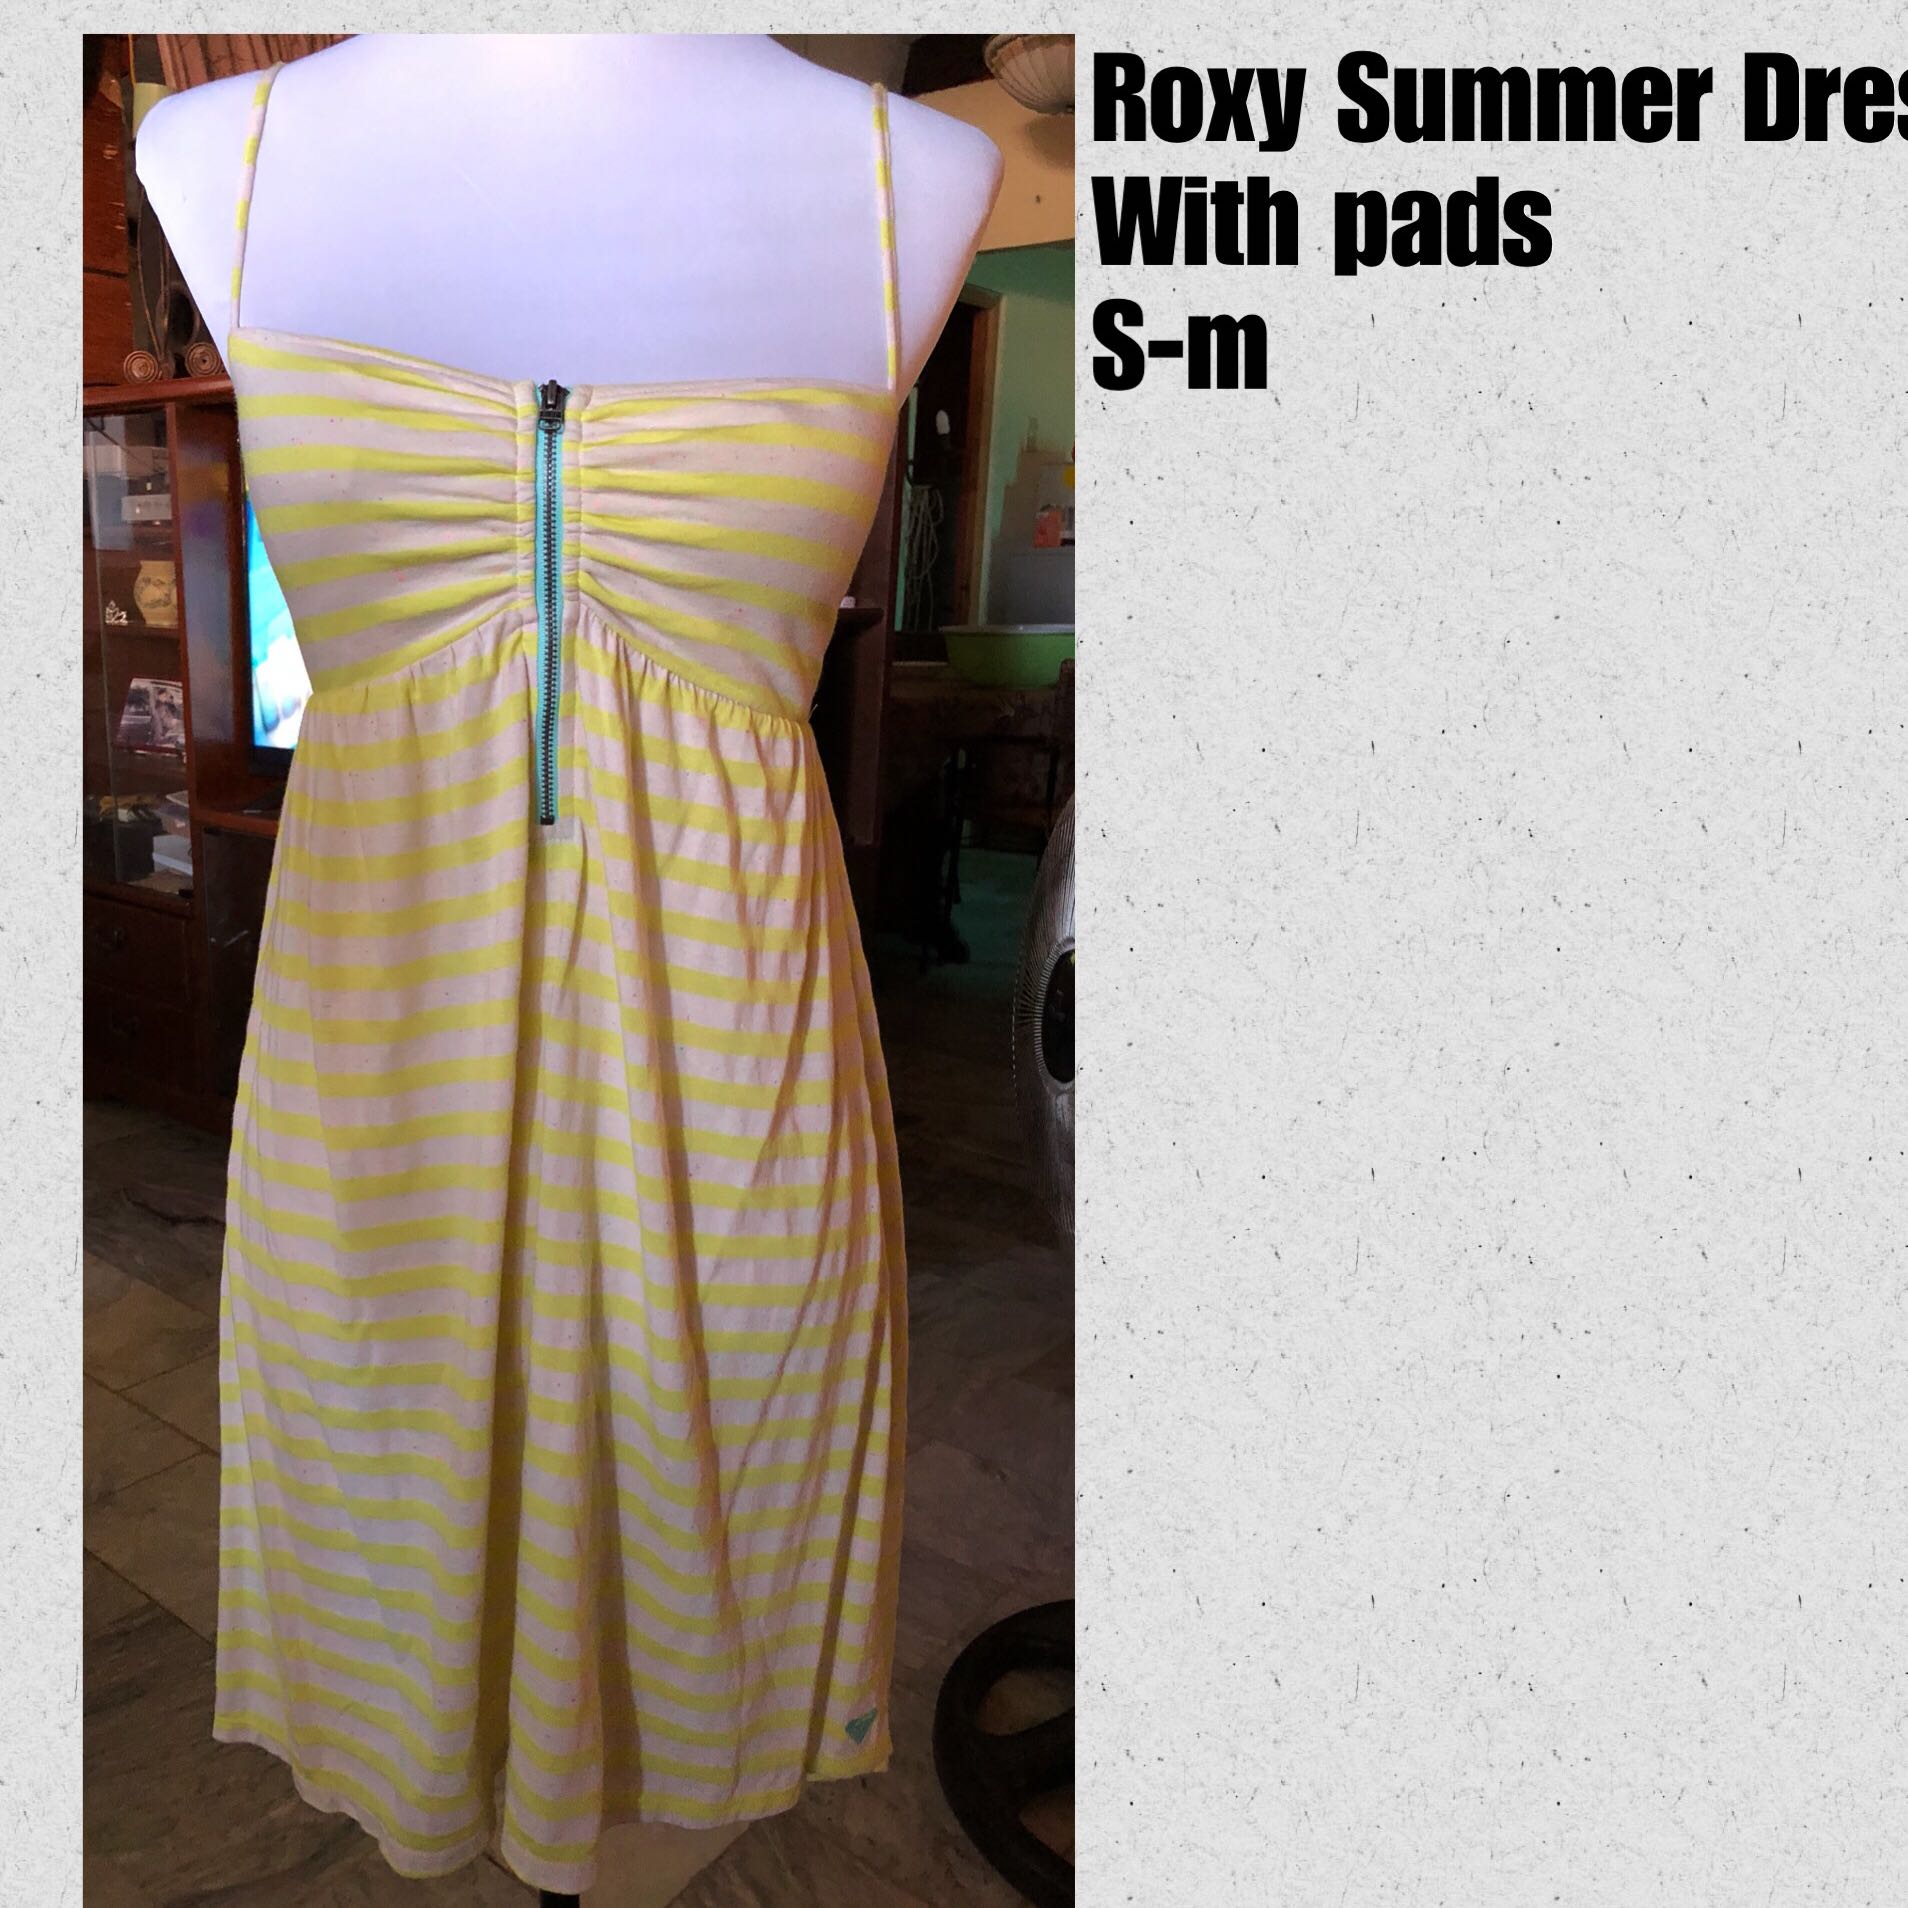 Roxy Summer Dress Padded